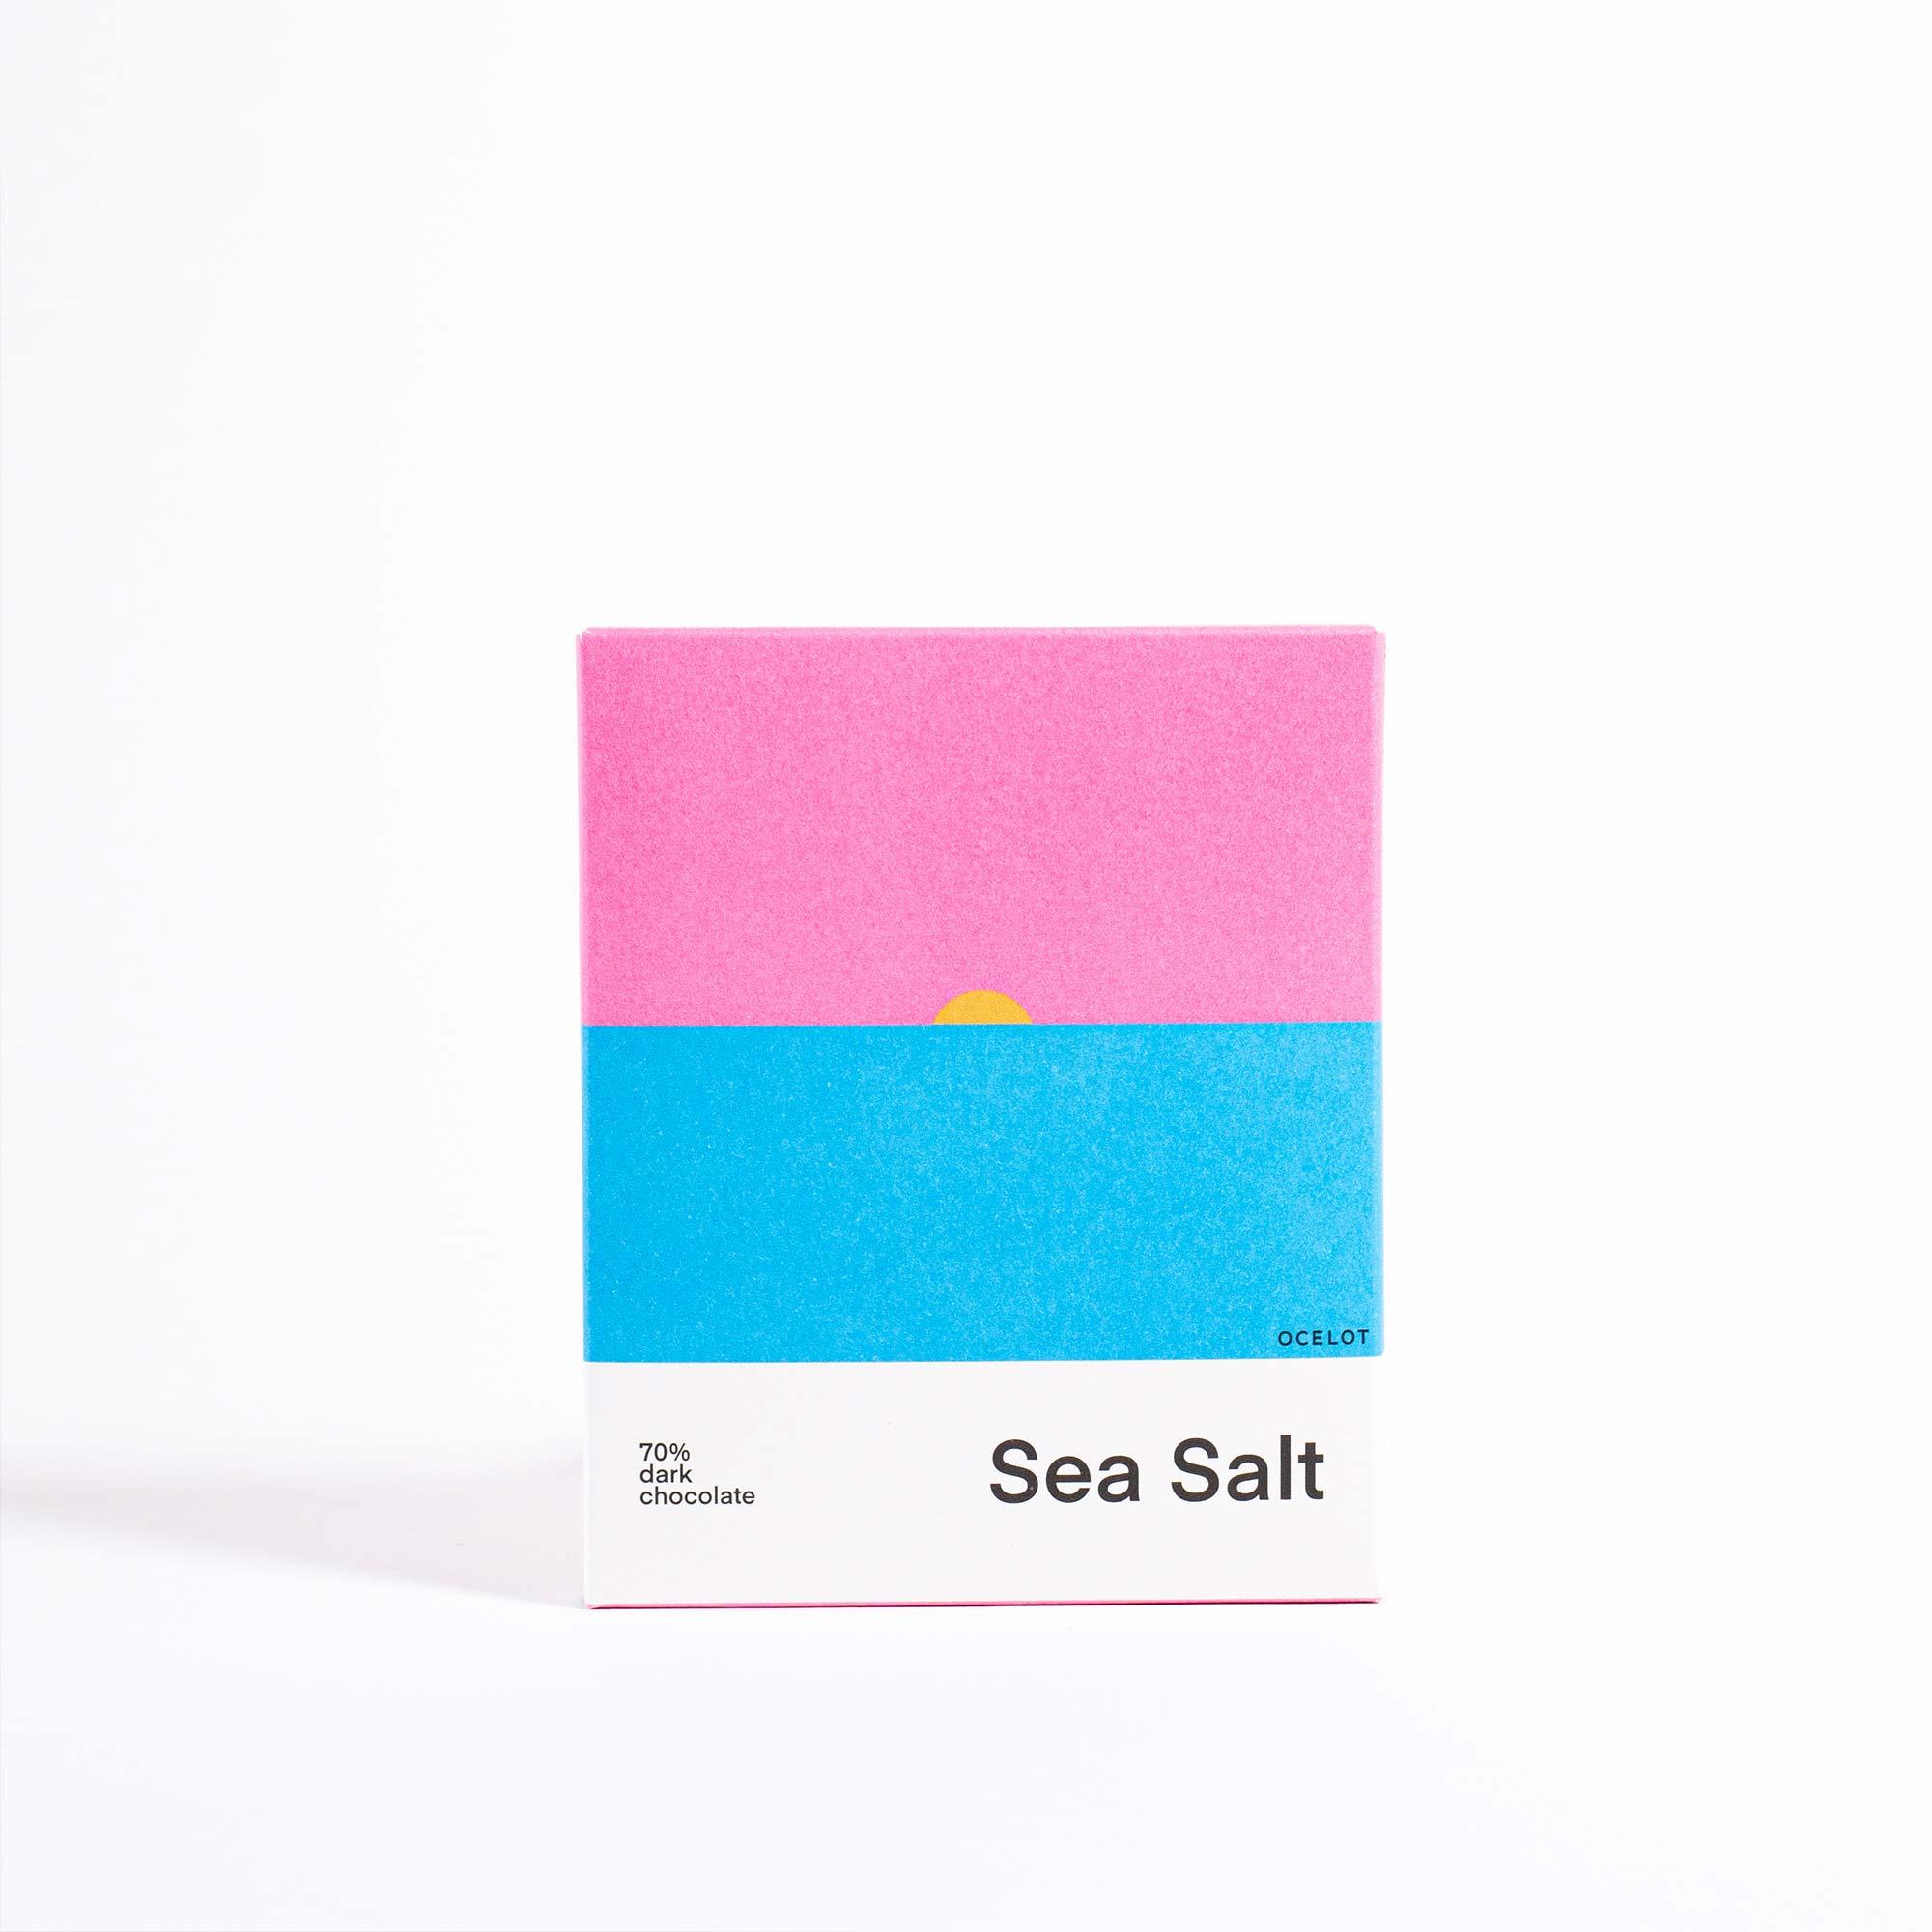 Grace and Green - OCELOT - Sea Salt 1